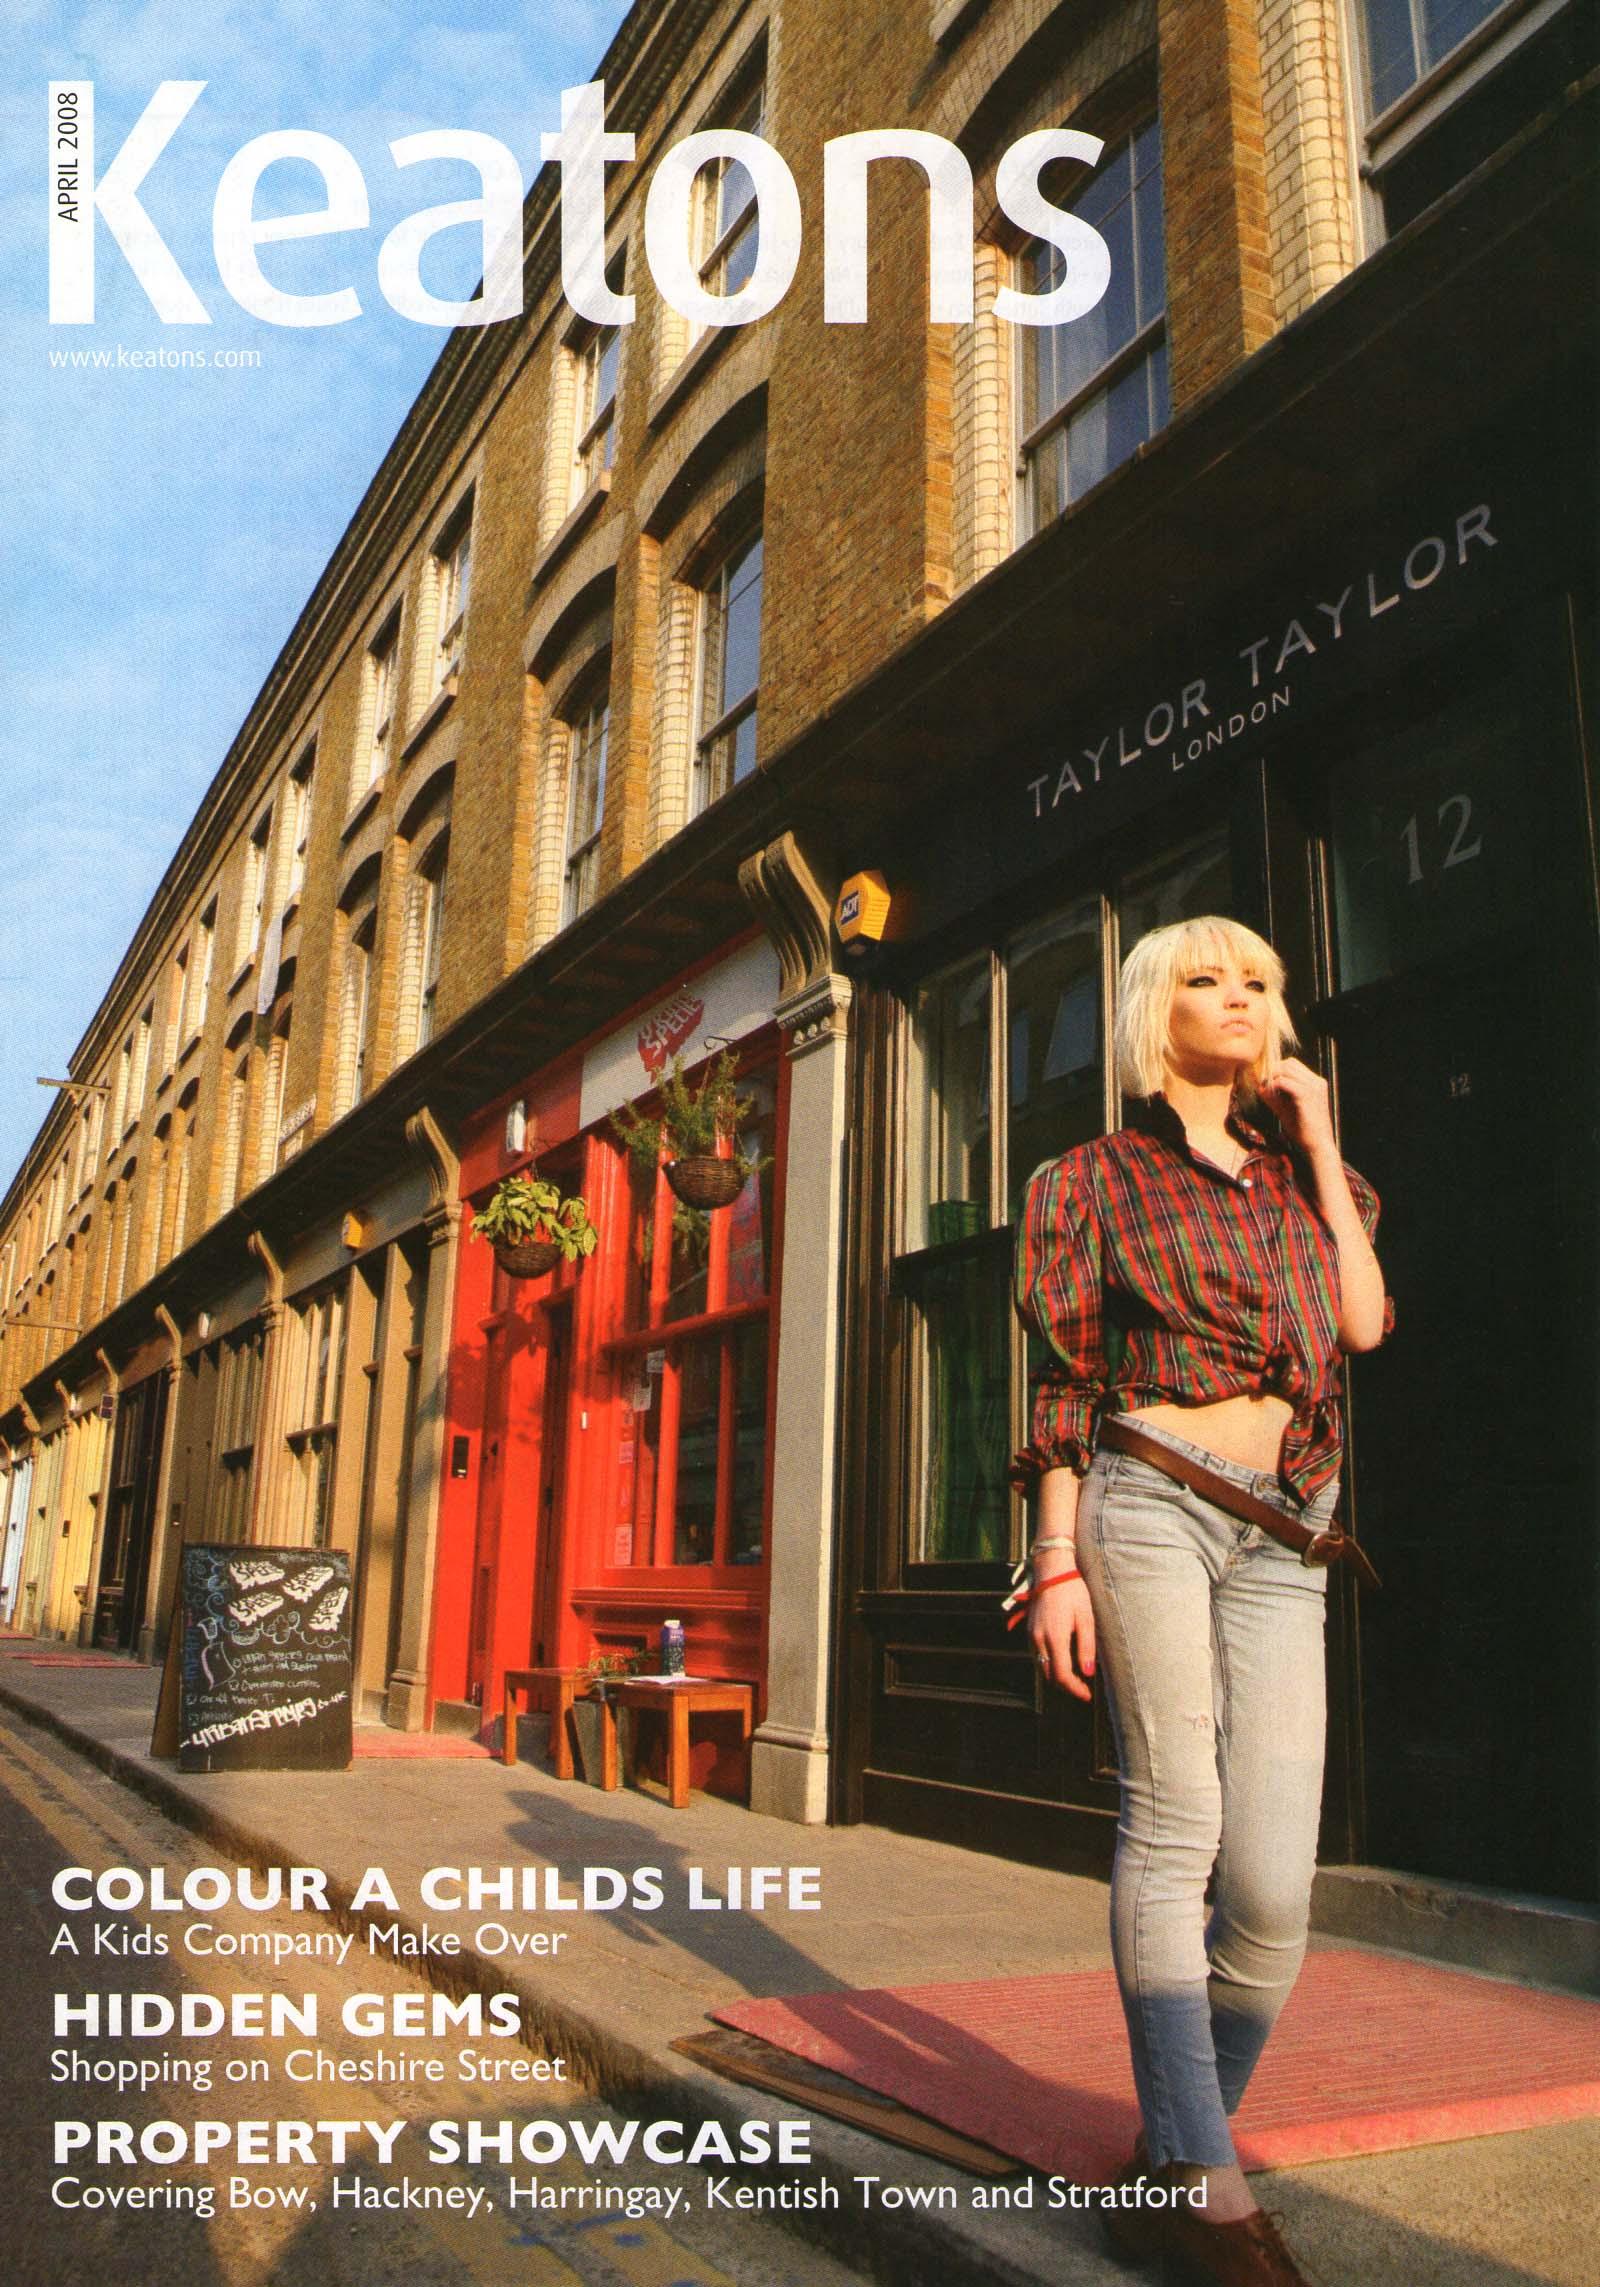 Keatons april 2008 cover.jpg